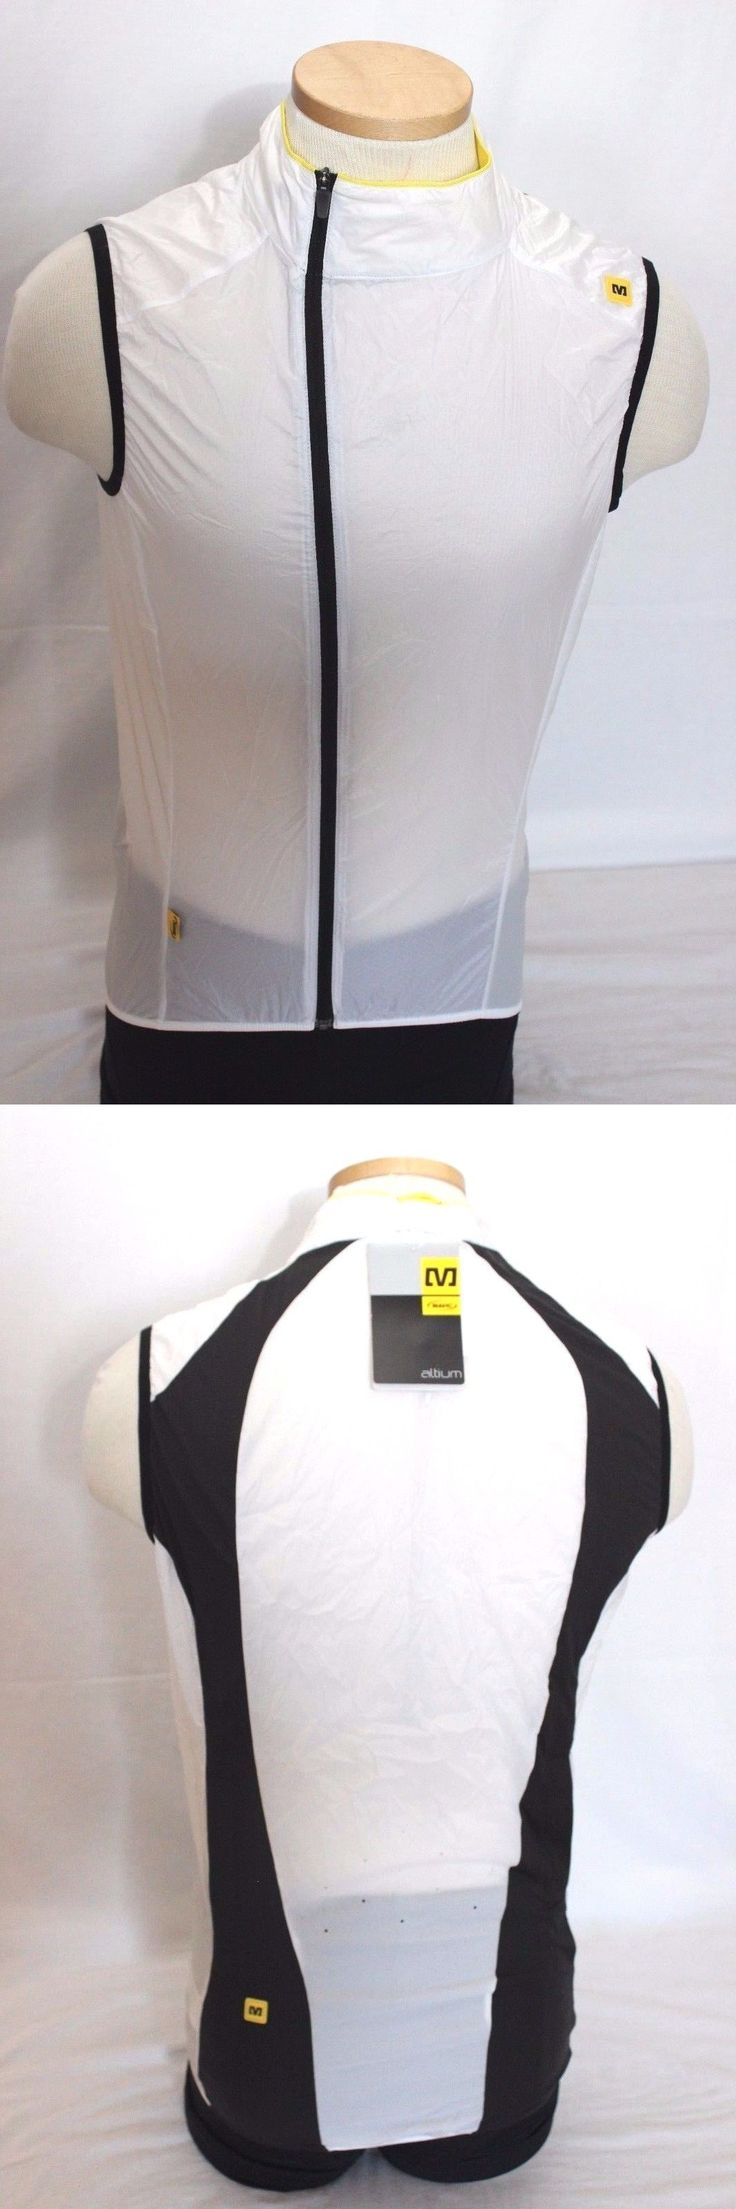 Vests 177856: New Mavic Men S Helium Cycling Vest Small White Bike Lightweight Vest Sleeveless -> BUY IT NOW ONLY: $30 on eBay!